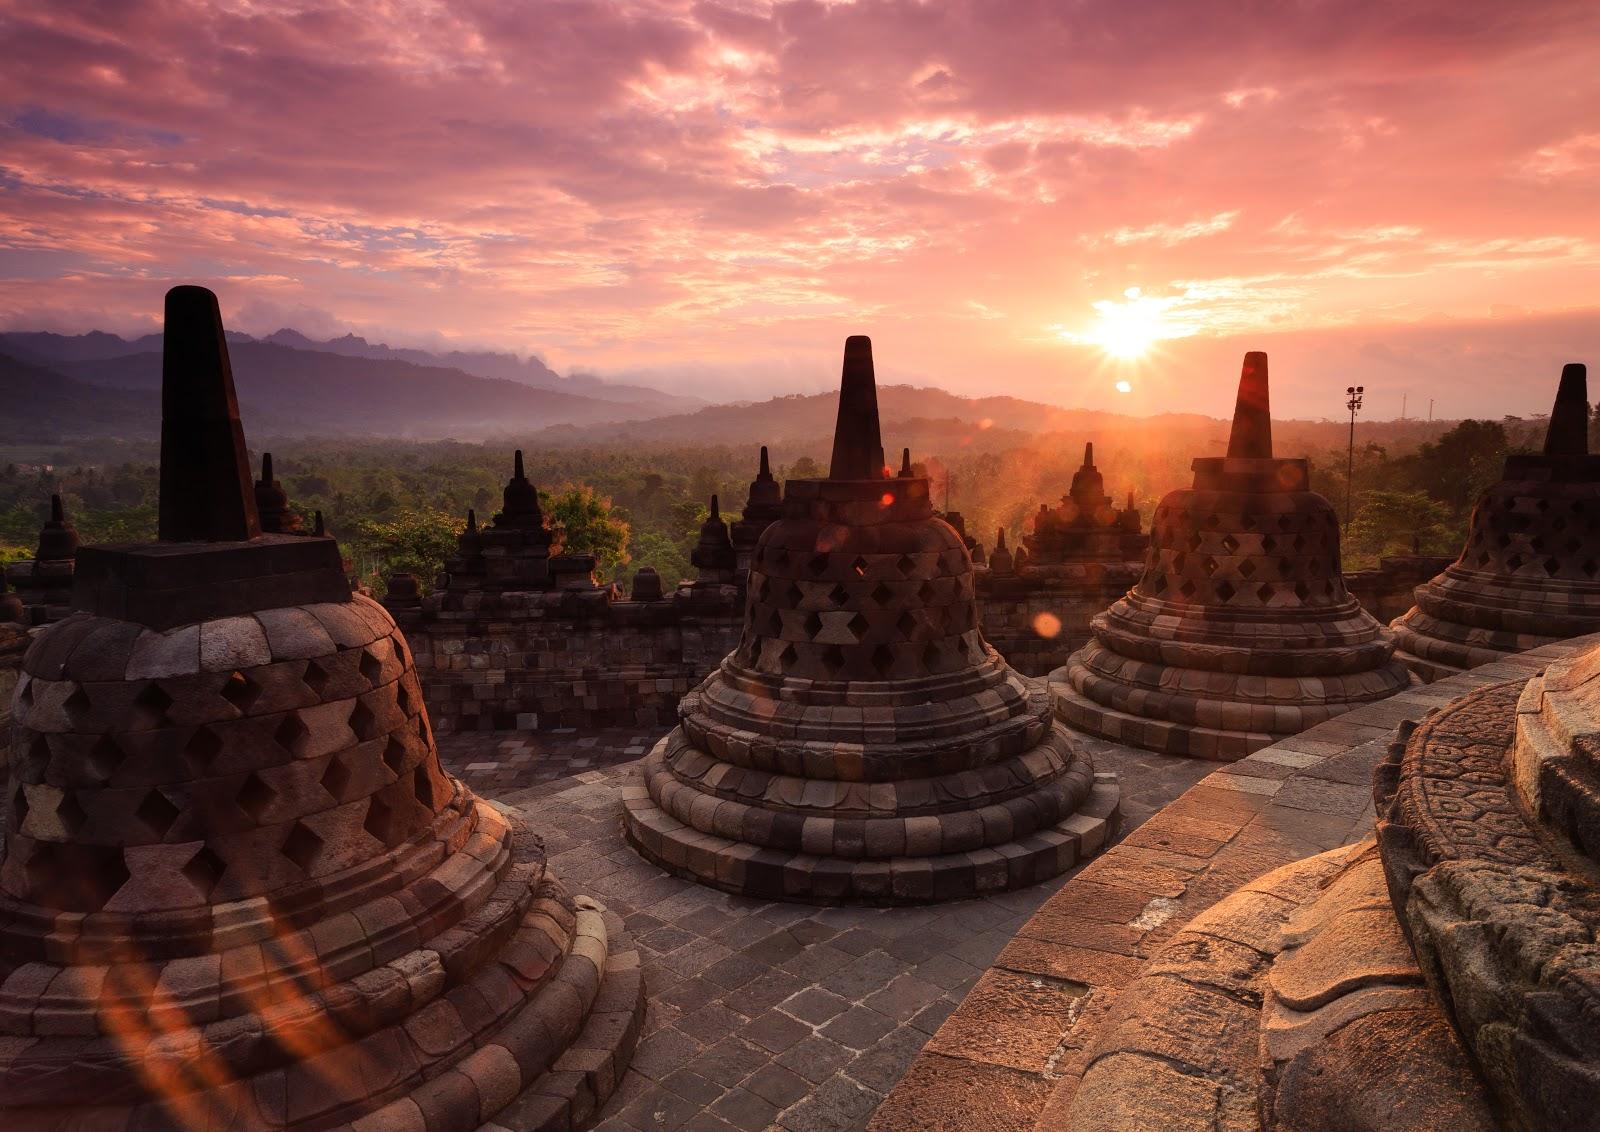 Candi Borobudur Kemegahan Candi Buddha Terbesar Dunia